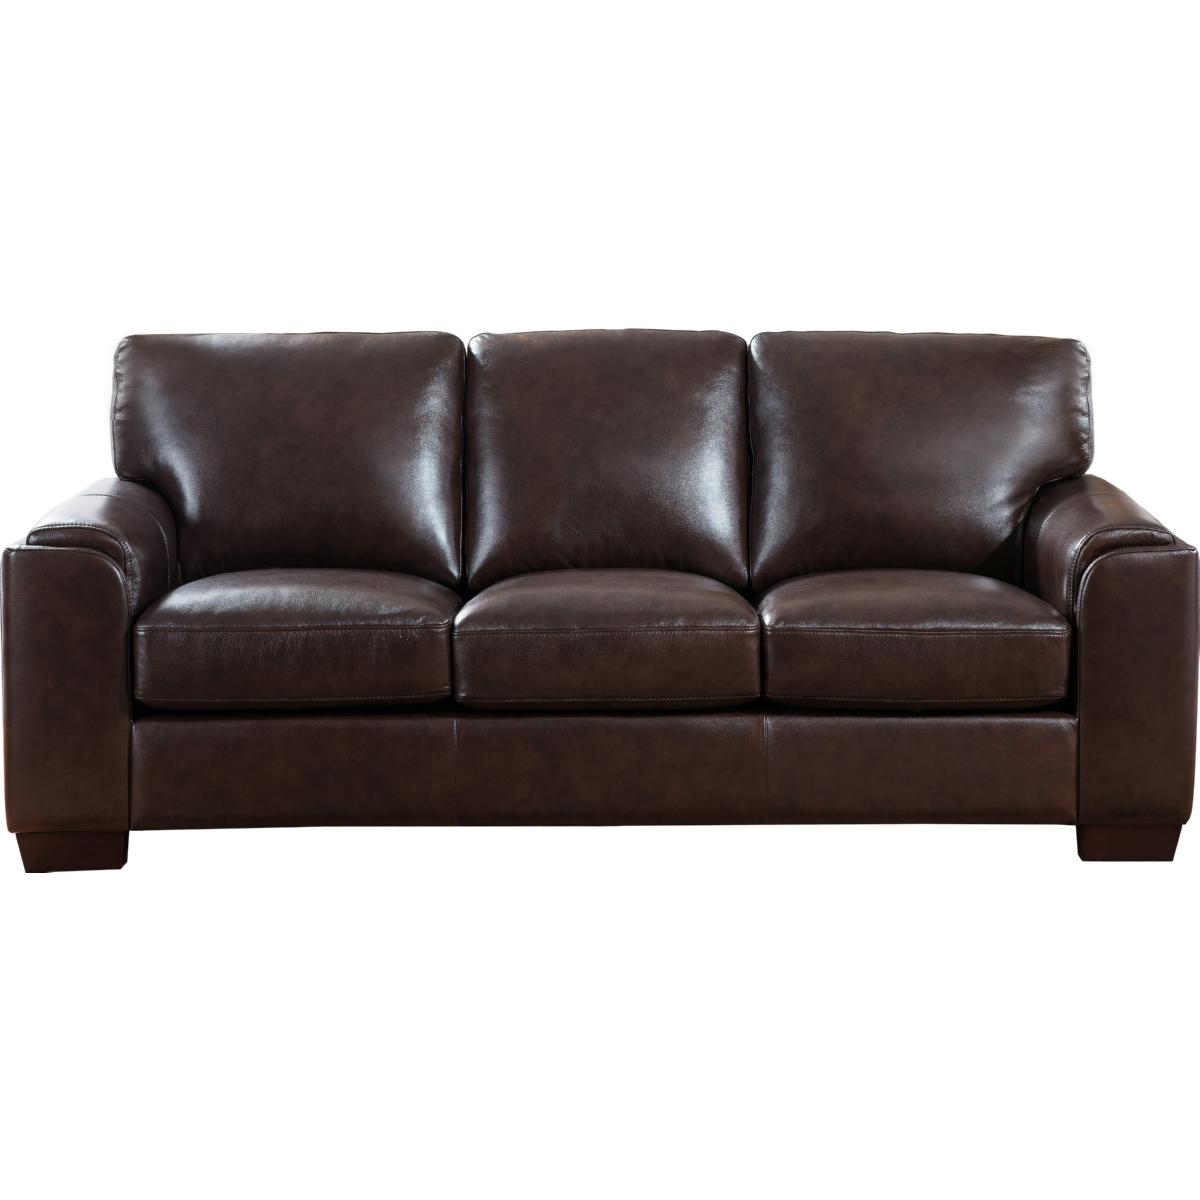 leathercraft sofa sectional sofas san jose reviews review home co